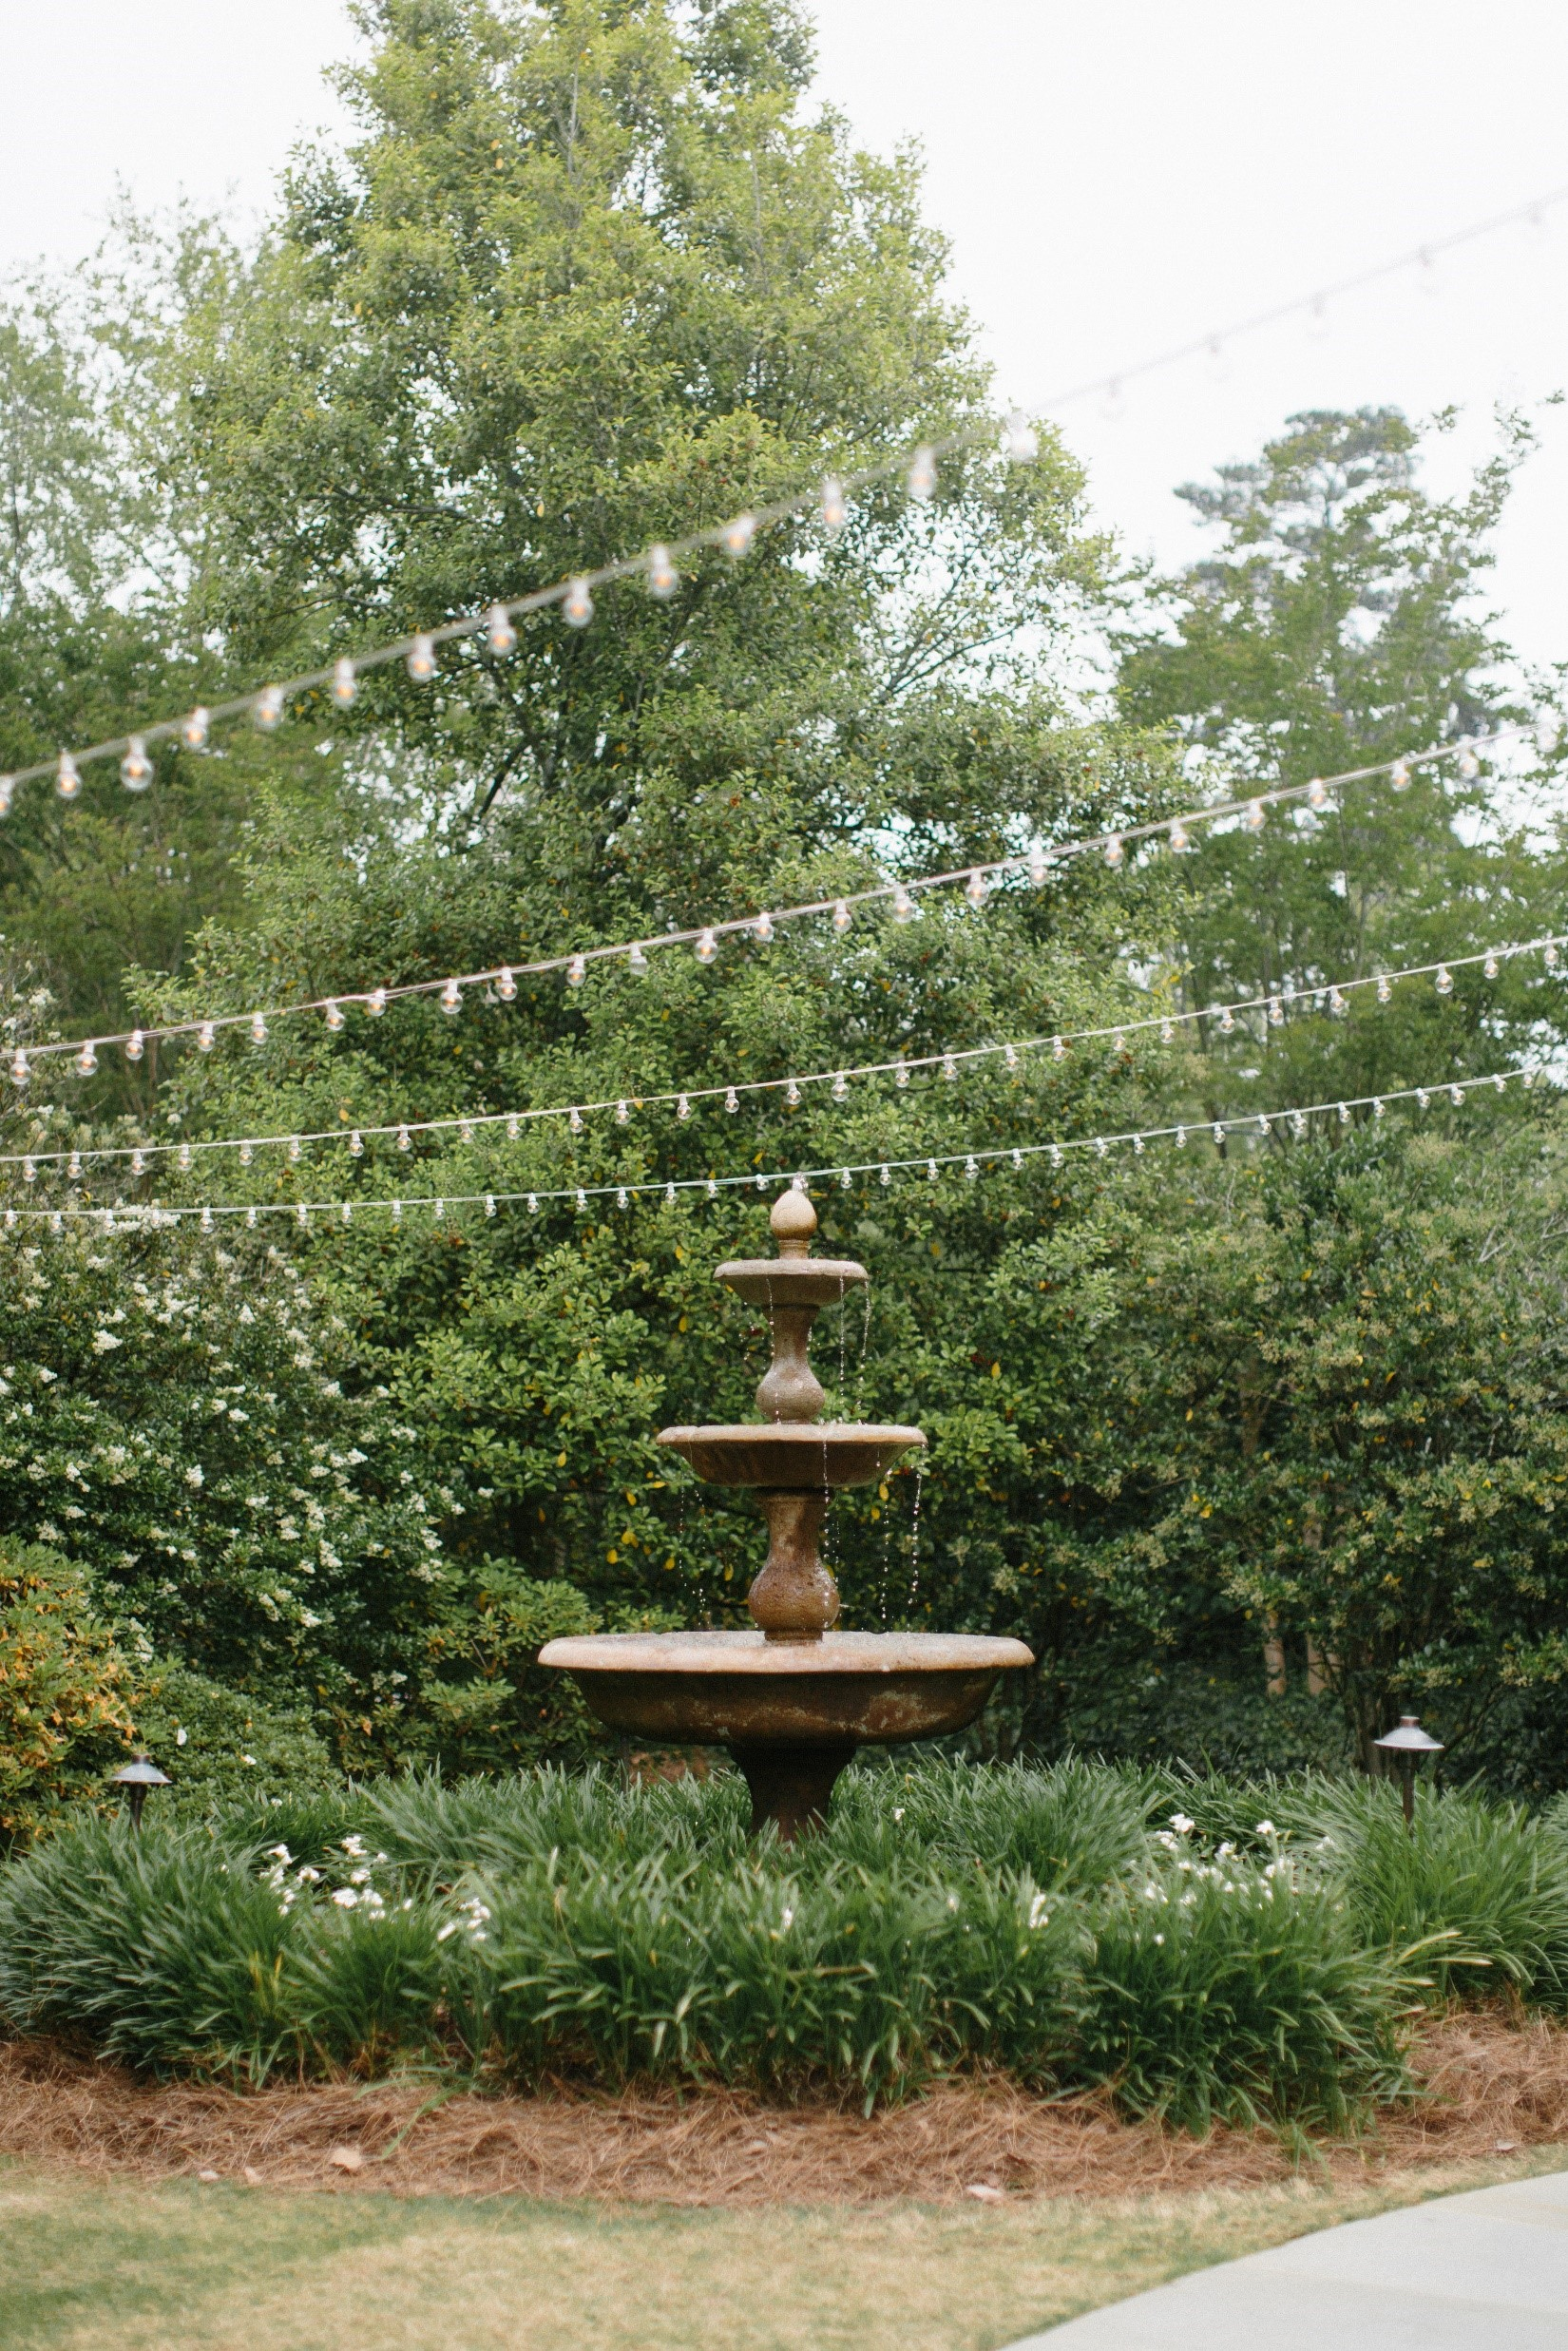 Fountain in Garden 4.jpg